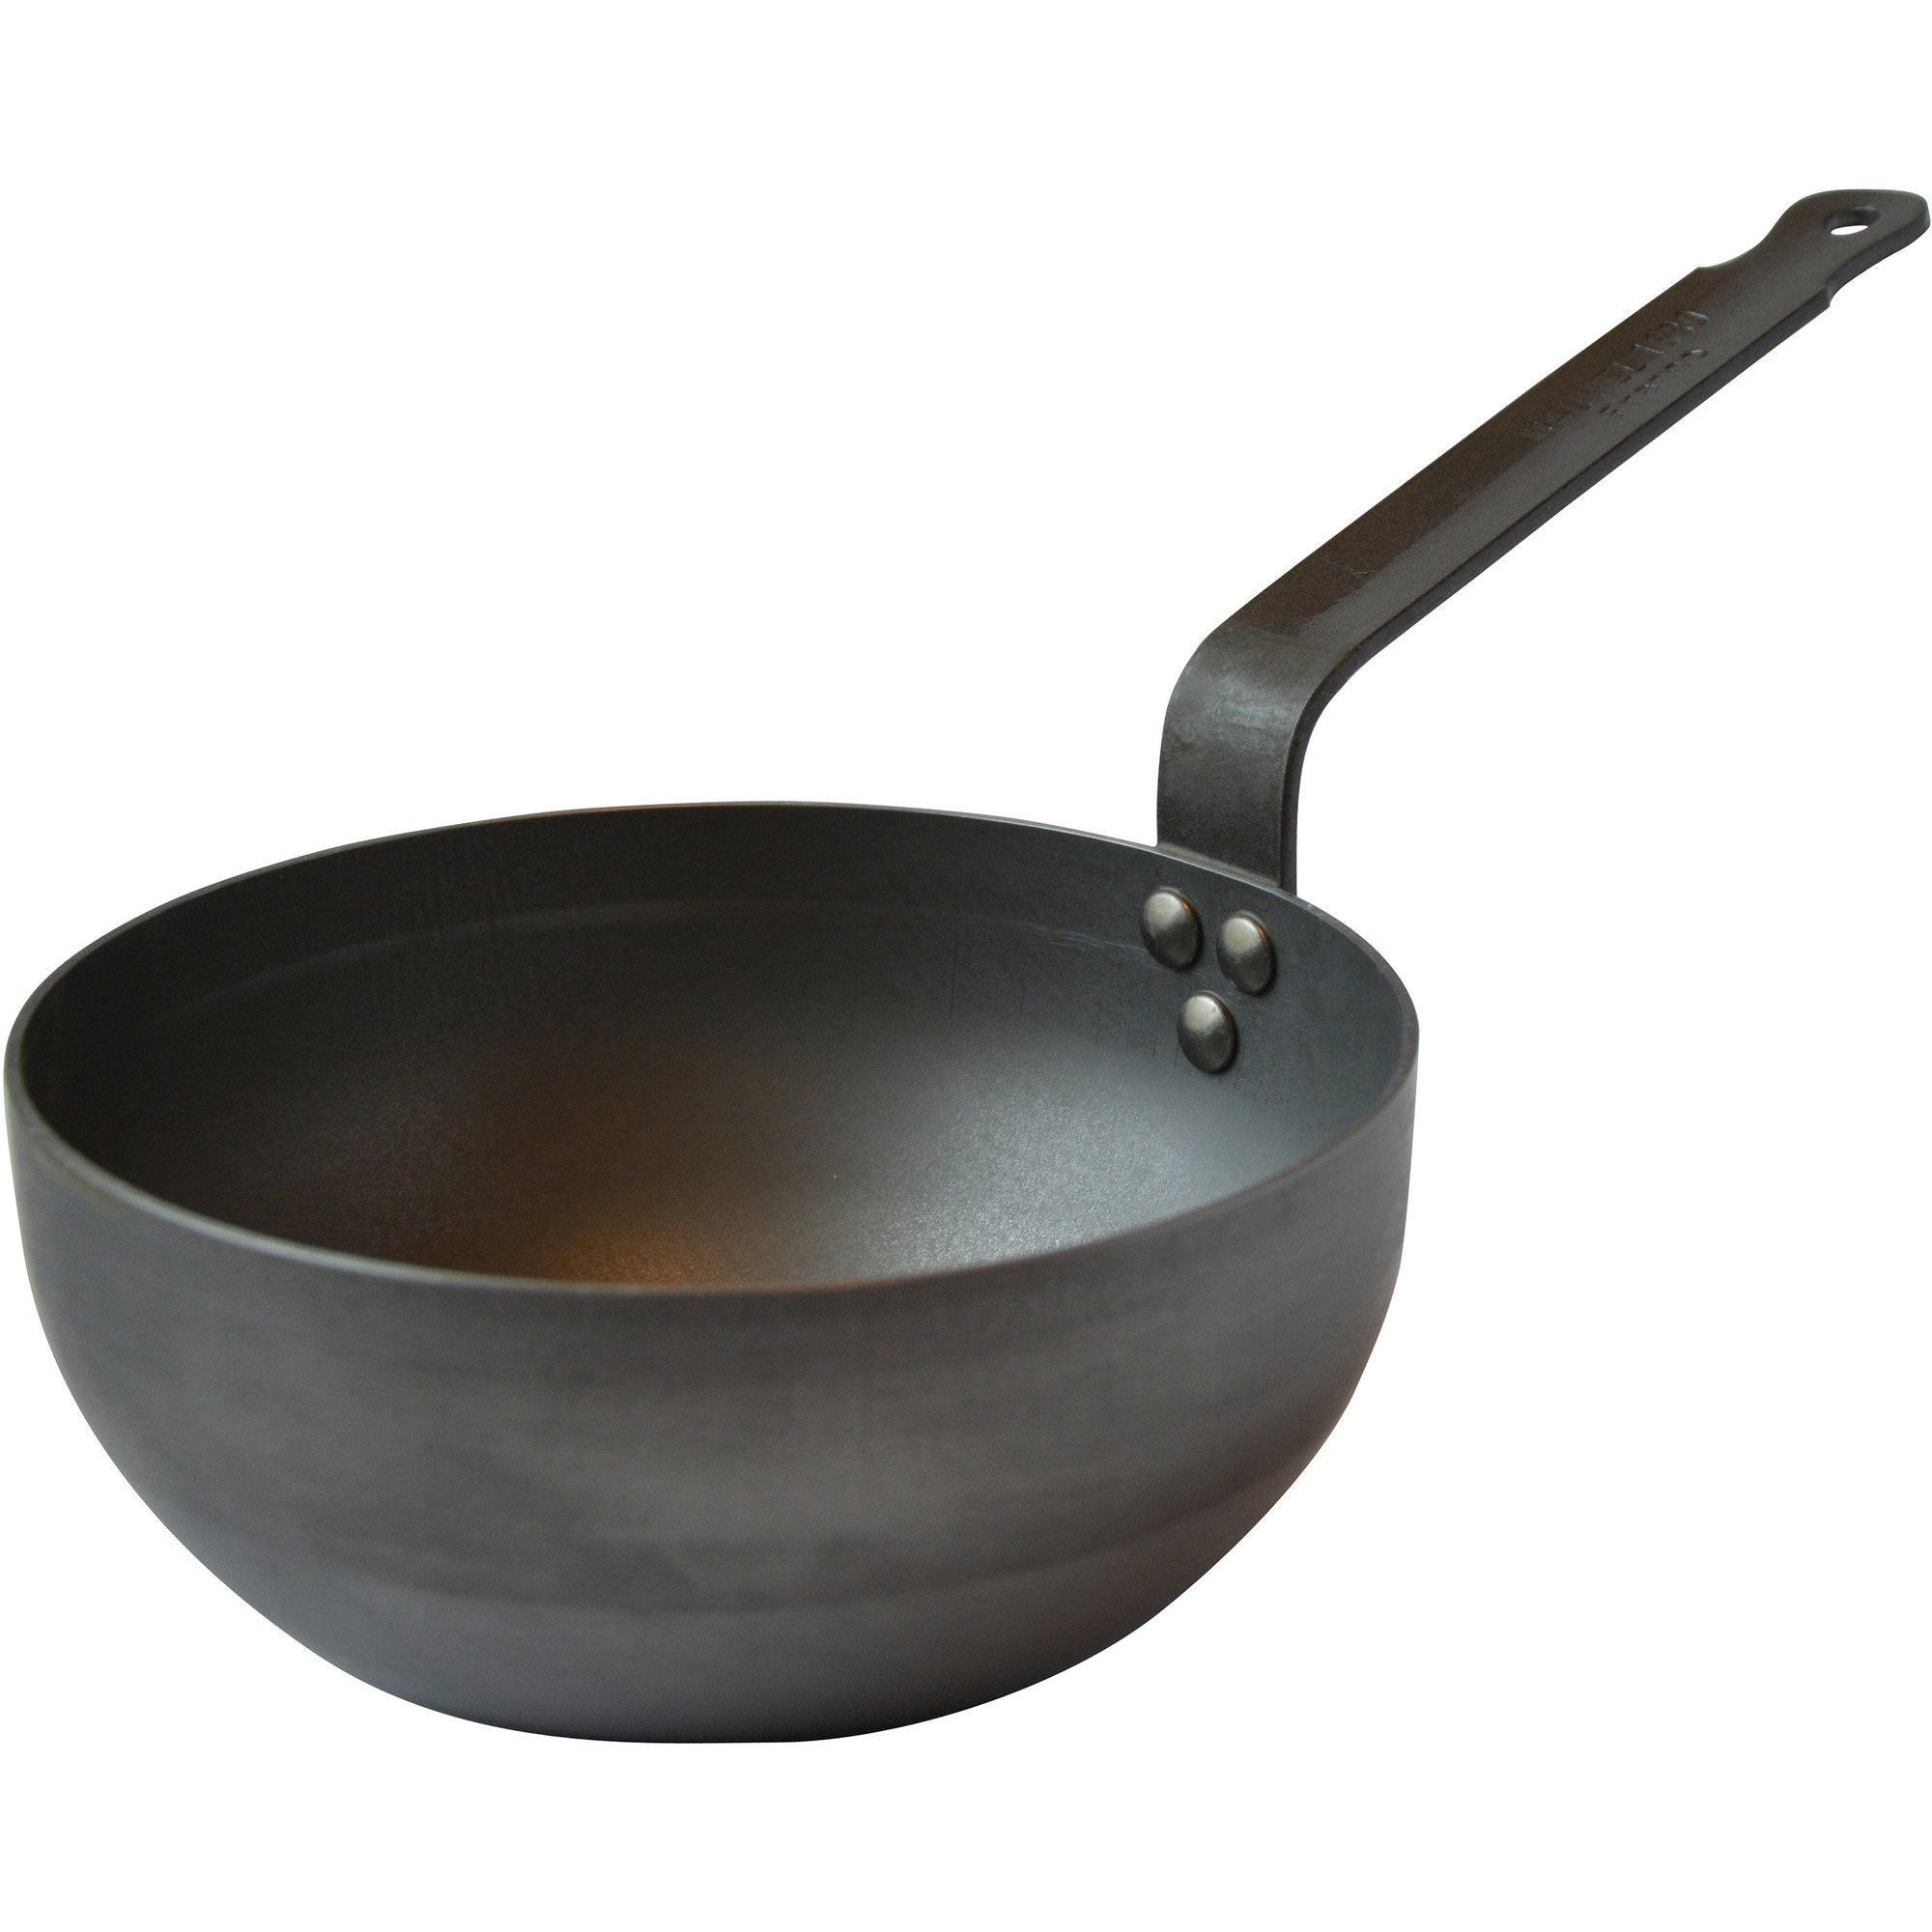 Mauviel Sautepanna rundat kolstål Ø 20 cm